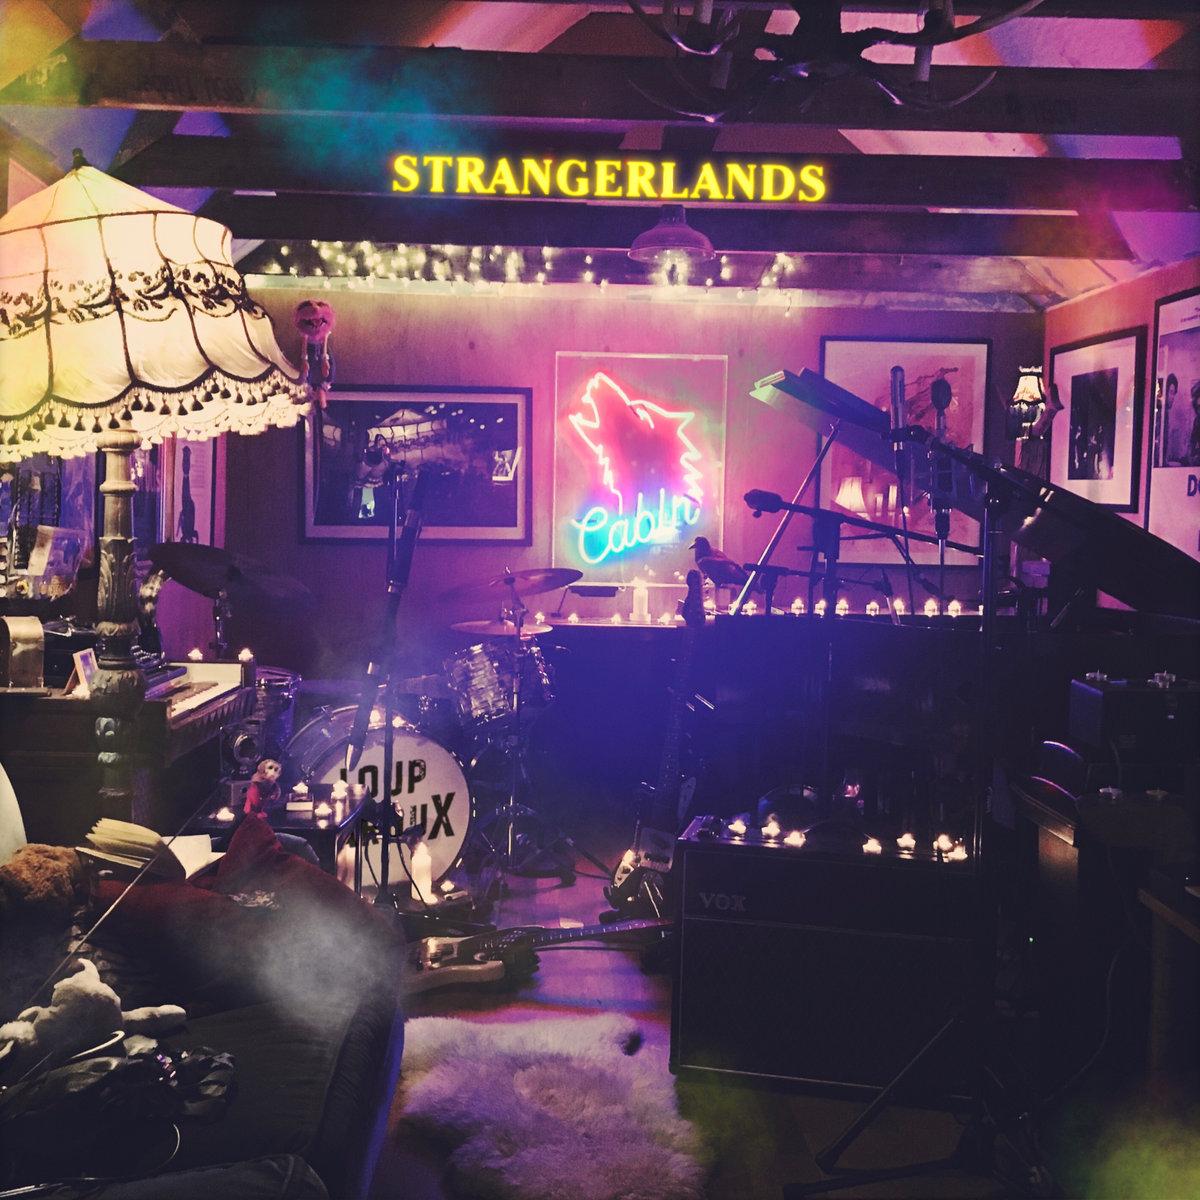 News – Loup GarouX – Strangerlands